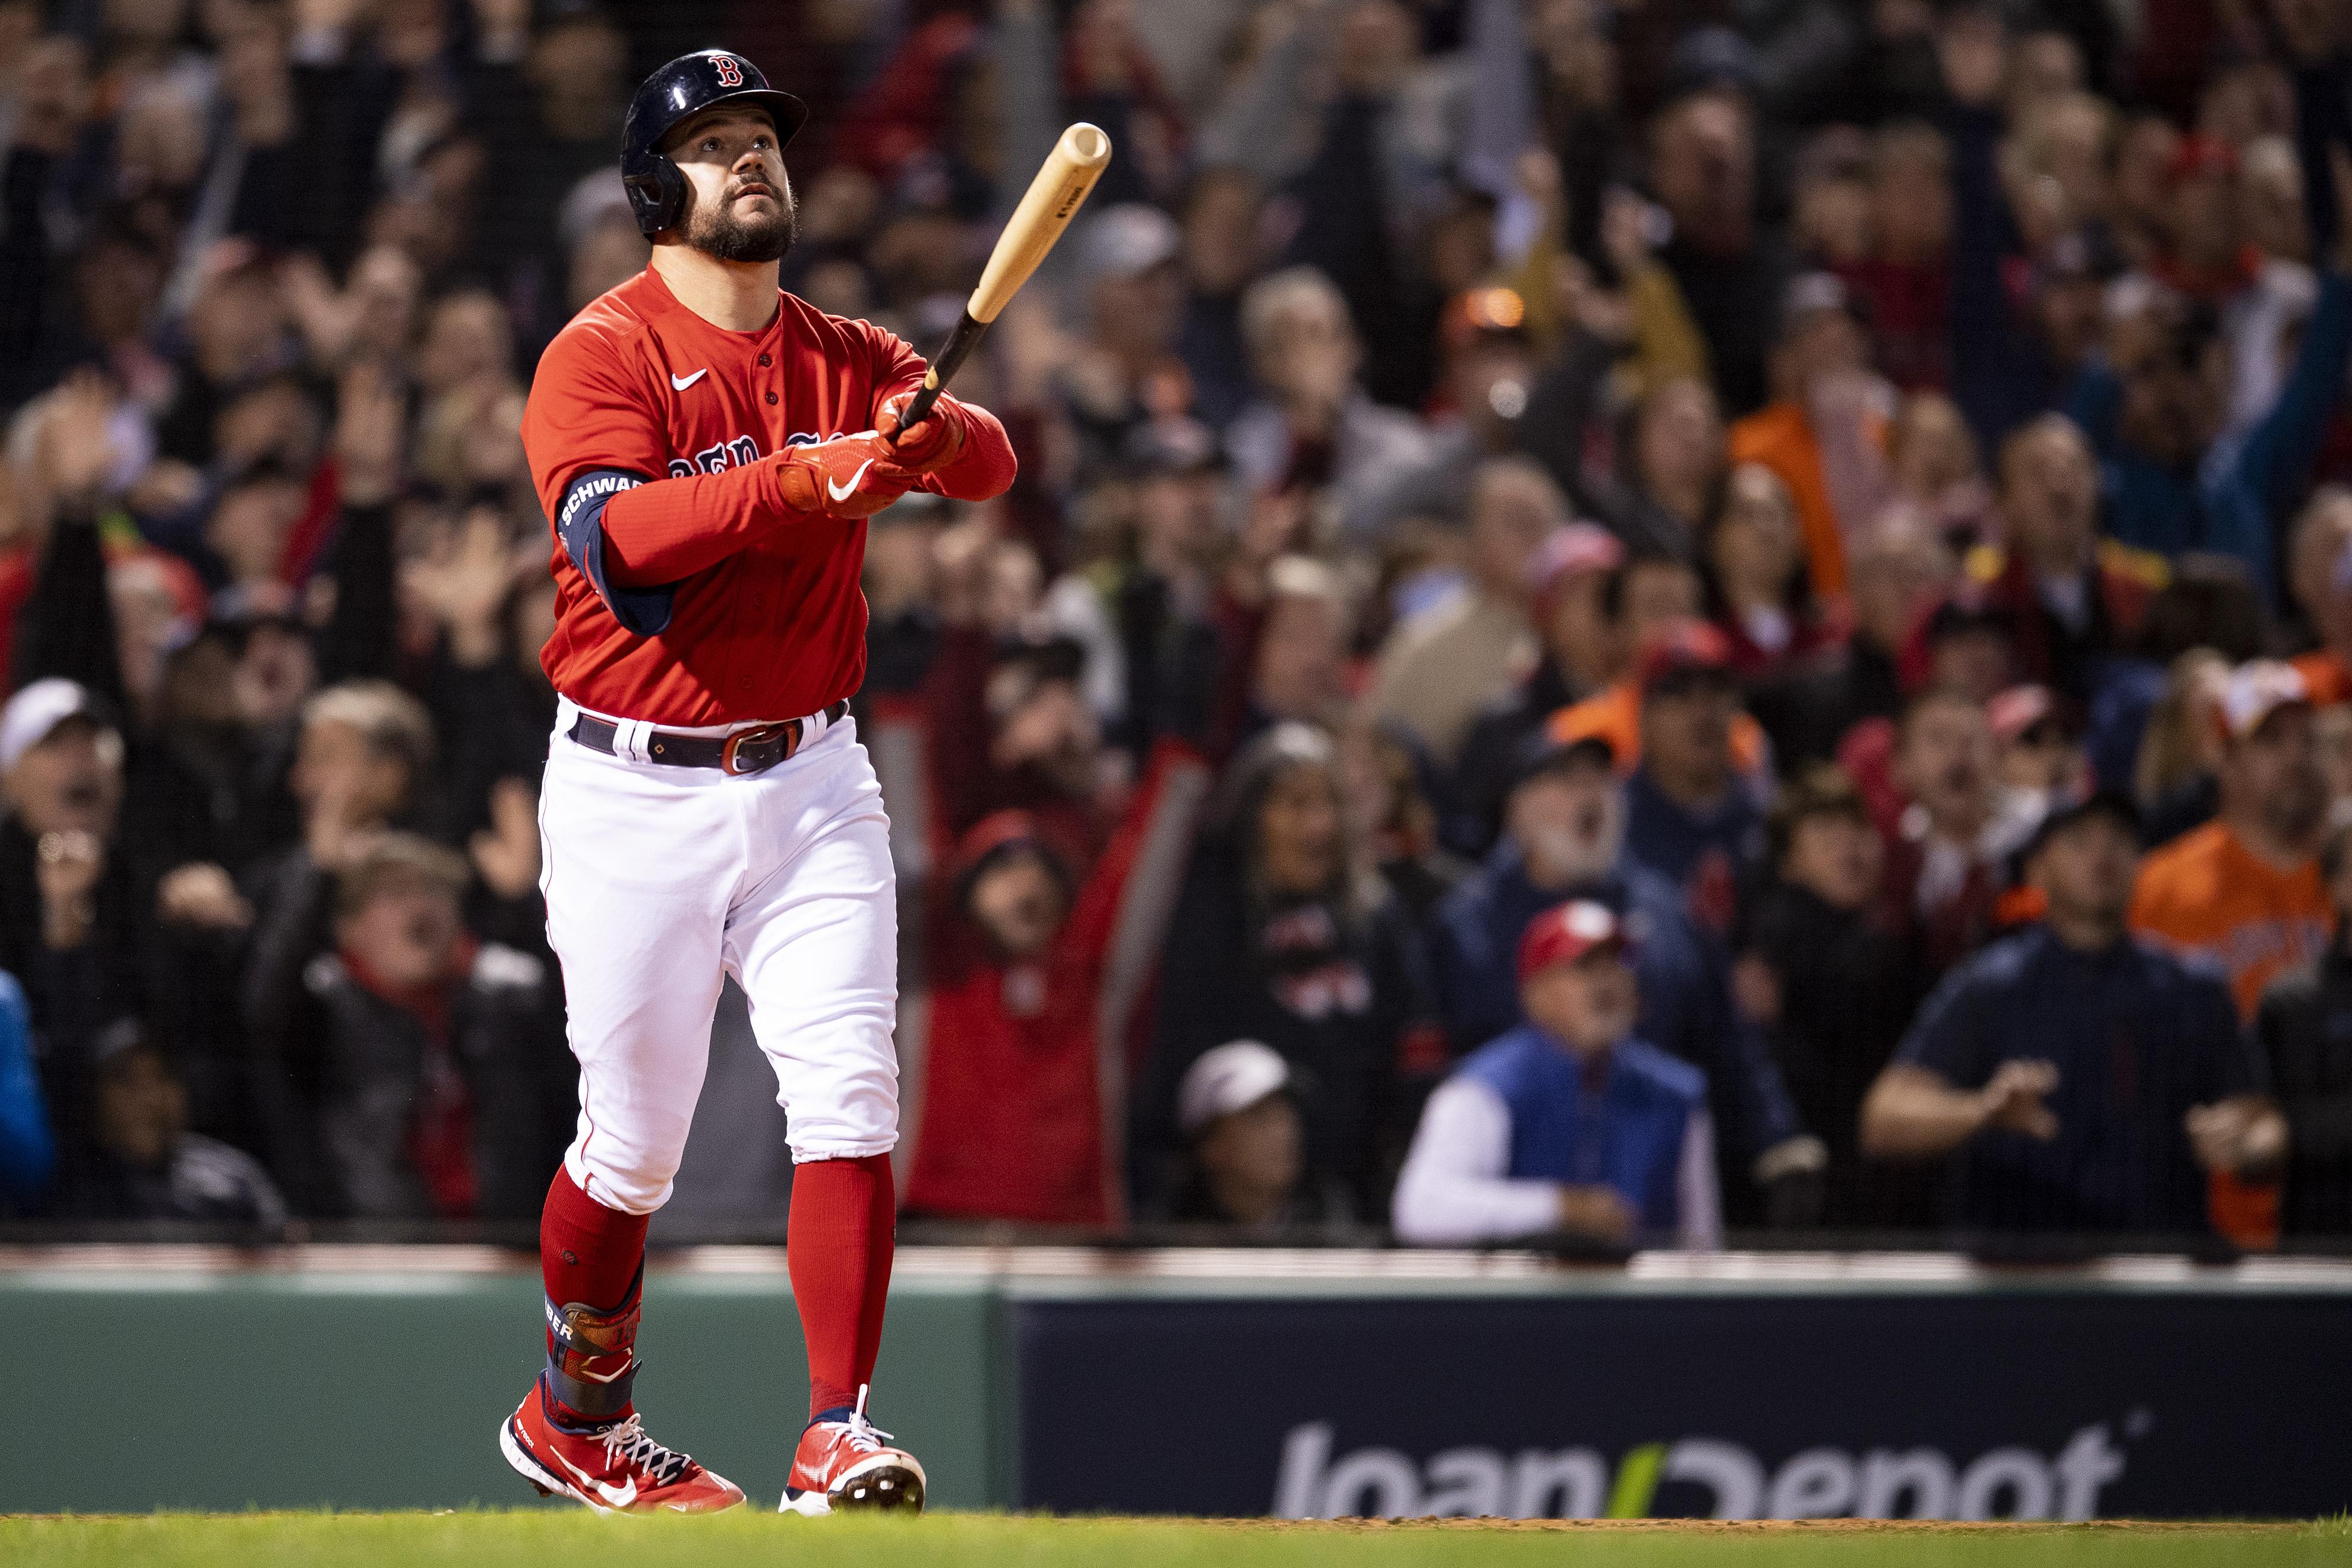 Championship Series - Houston Astros v Boston Red Sox - Game Three